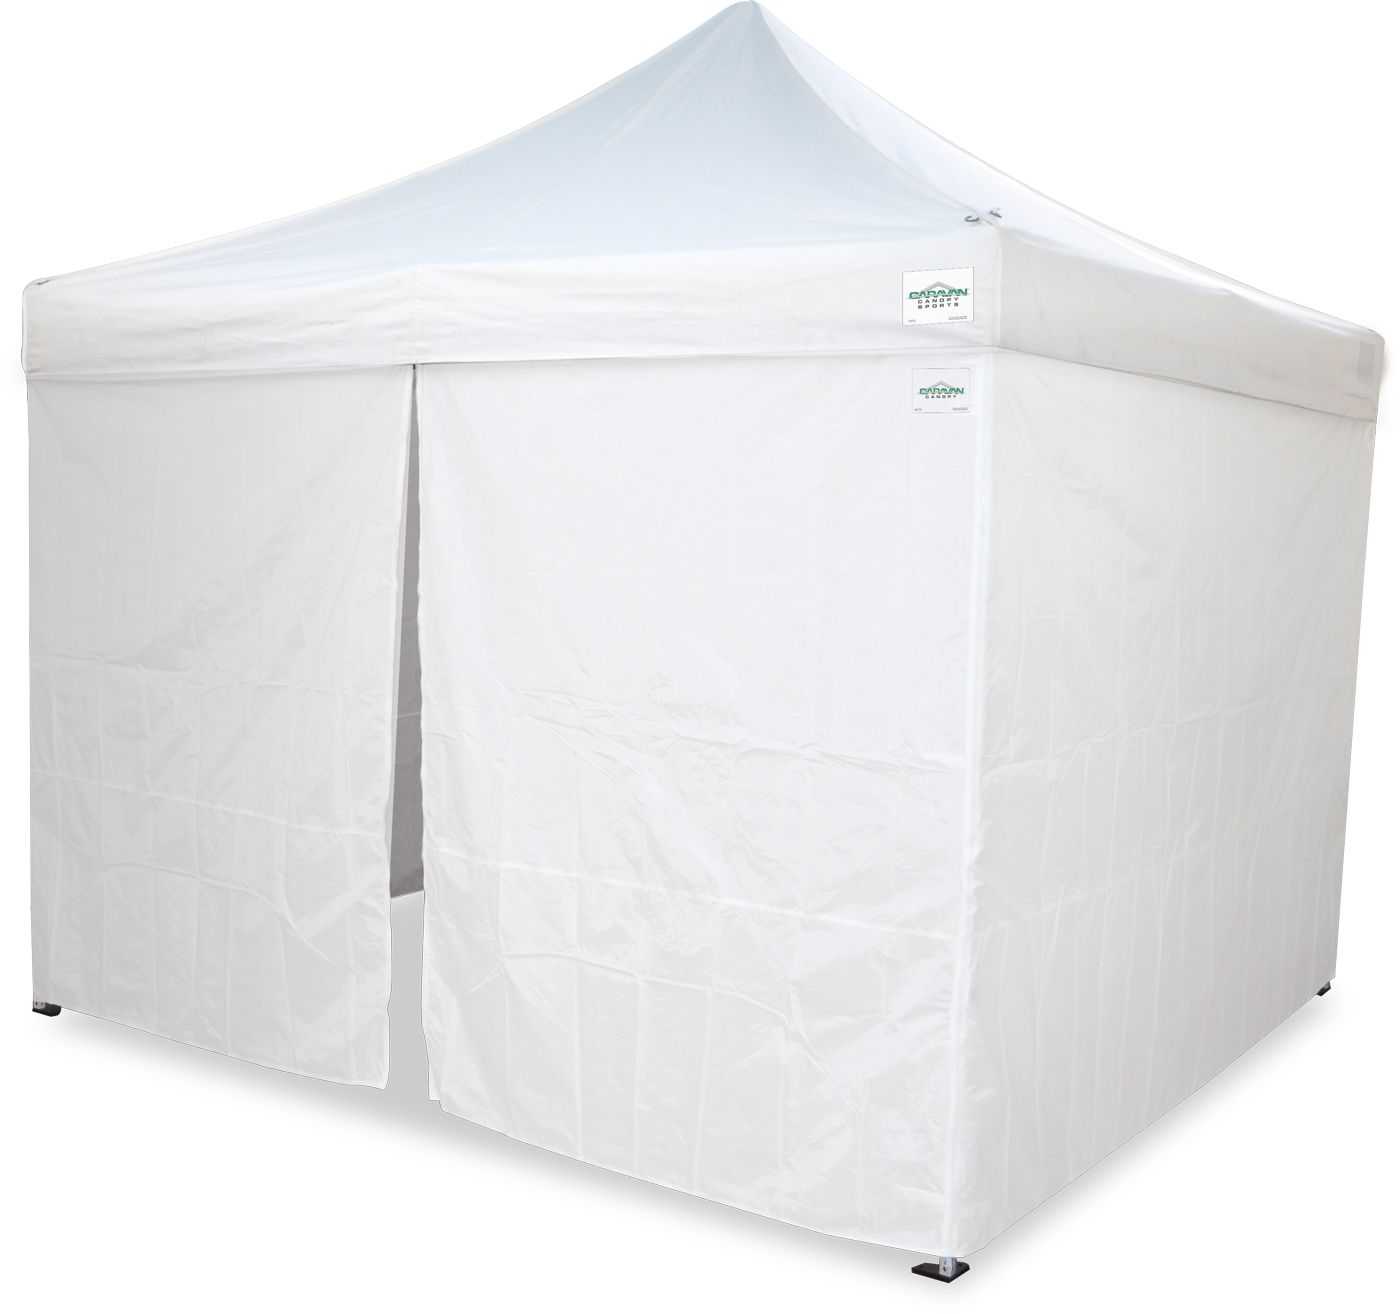 Caravan Canopy 10' x 10' Straight Leg Canopy Sidewalls